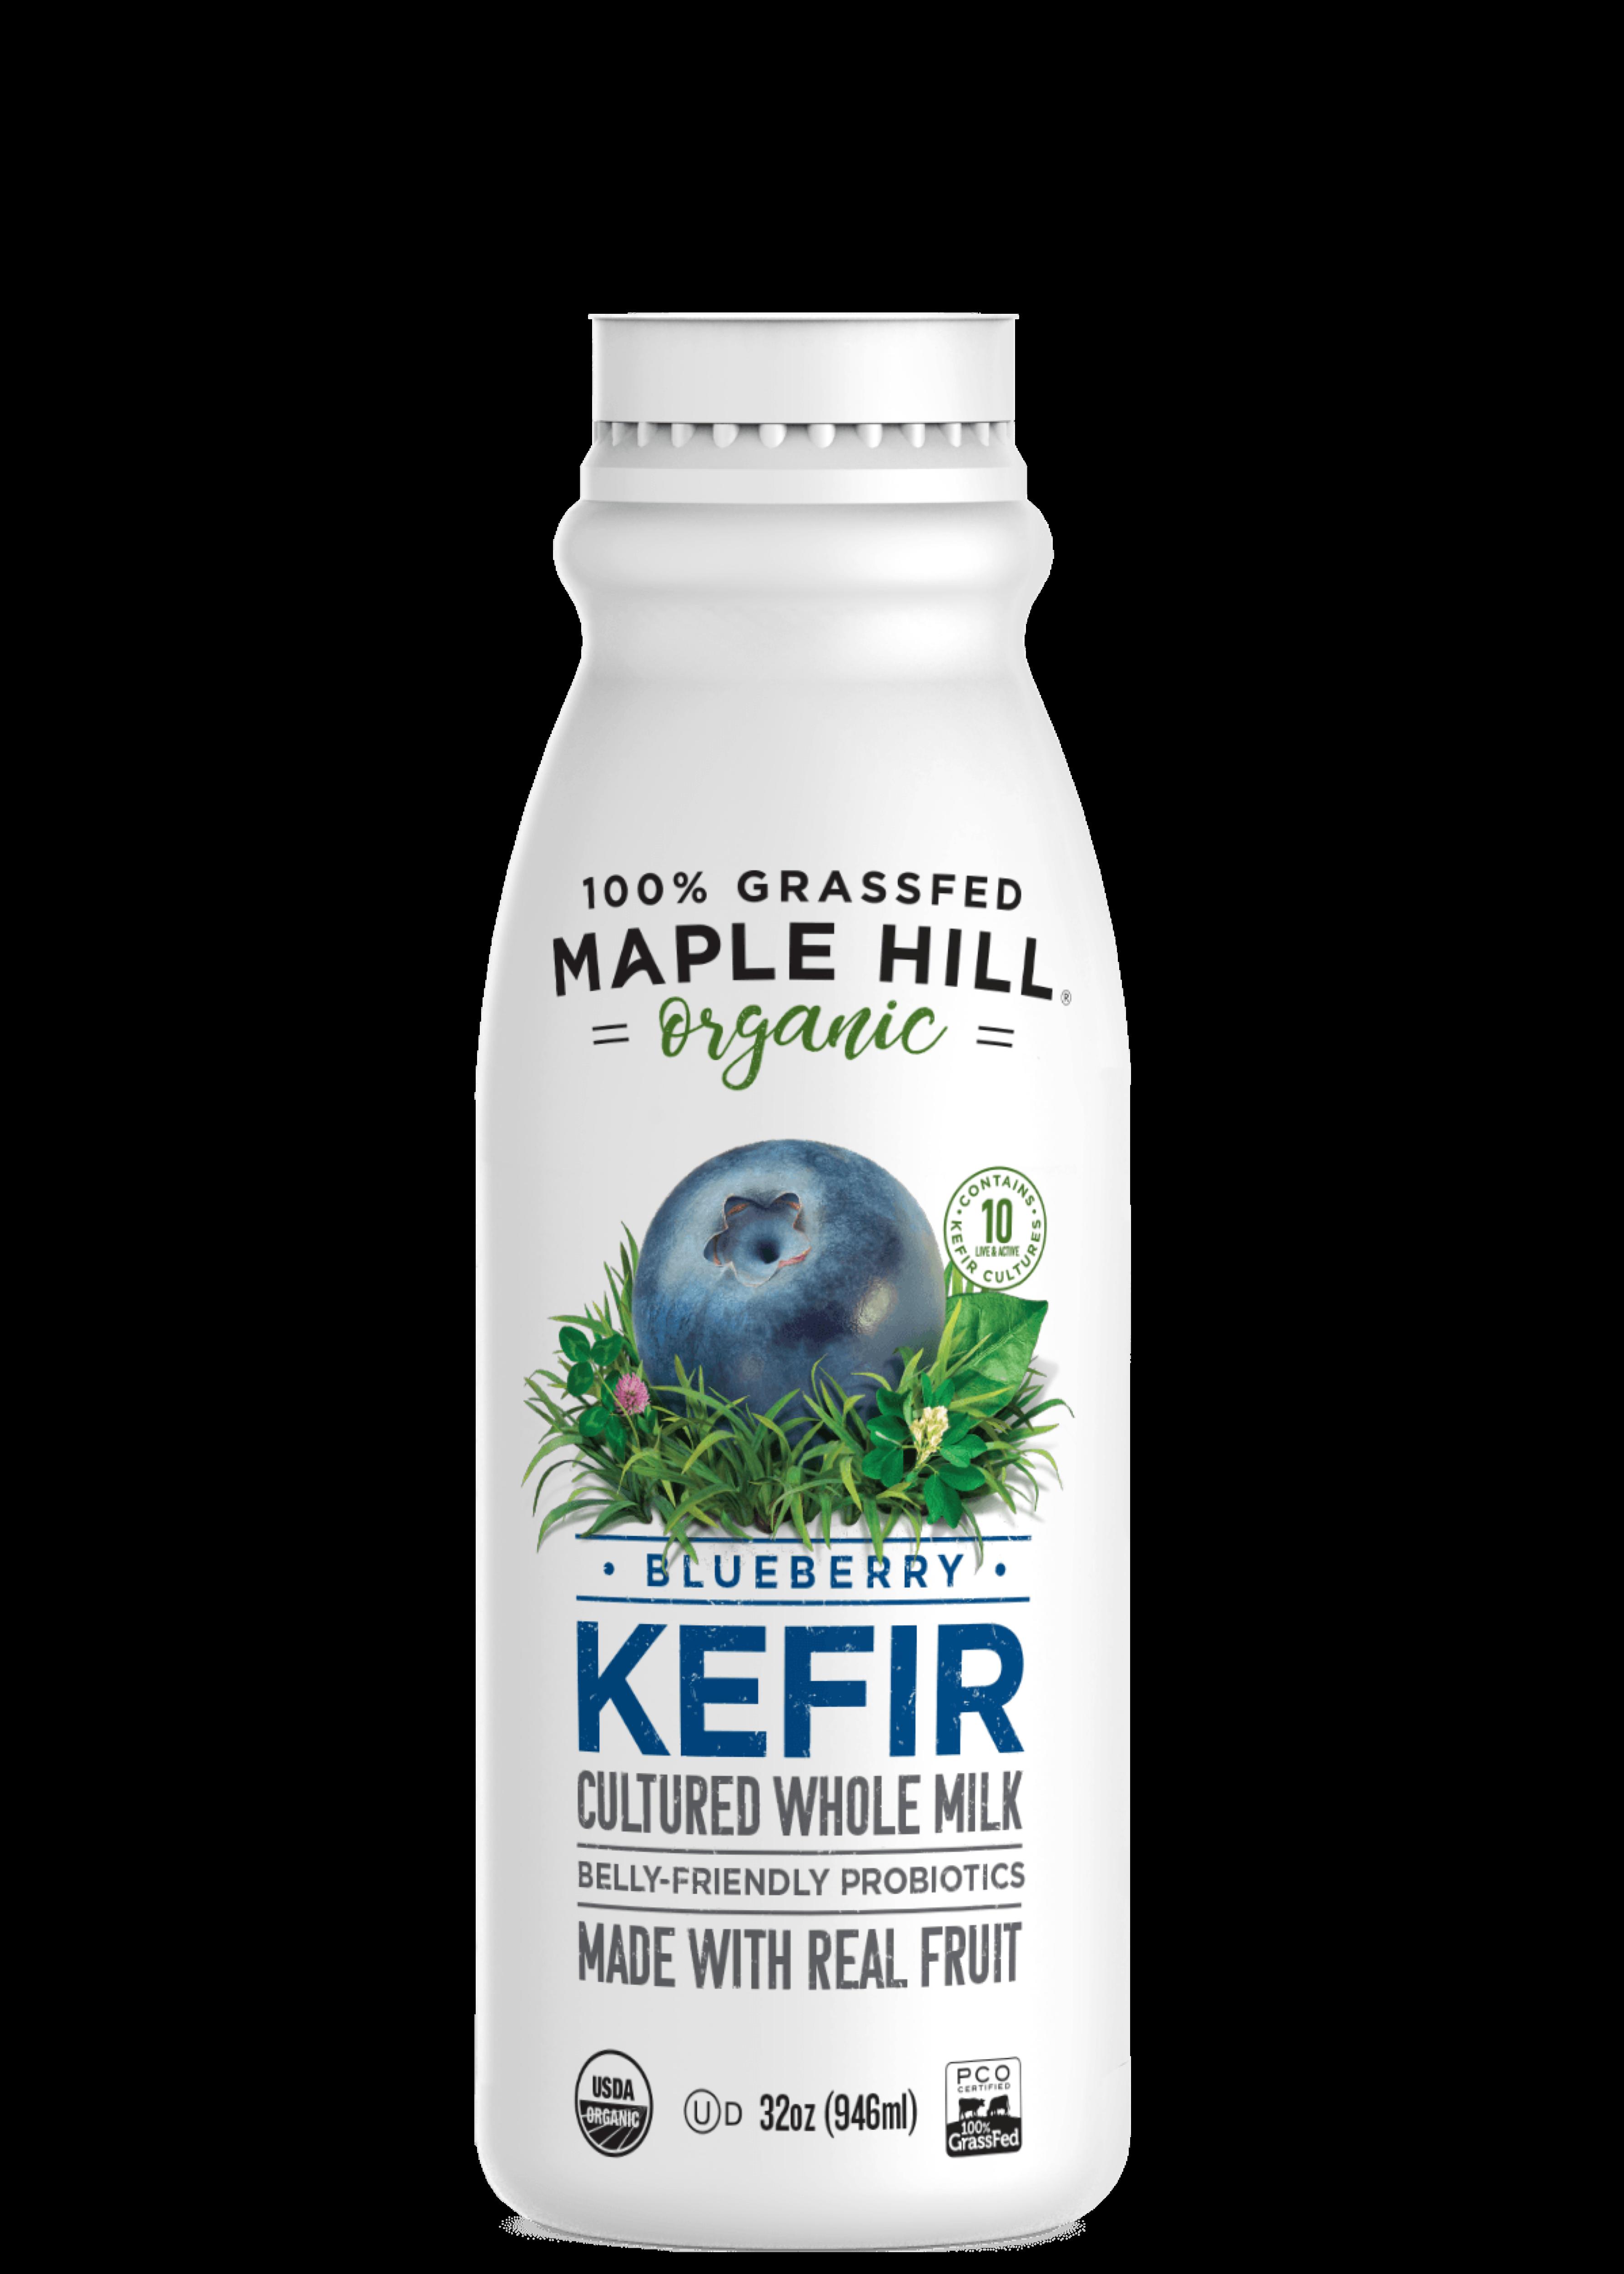 Kefir Kefir Organic Maple Syrup Grass Fed Milk